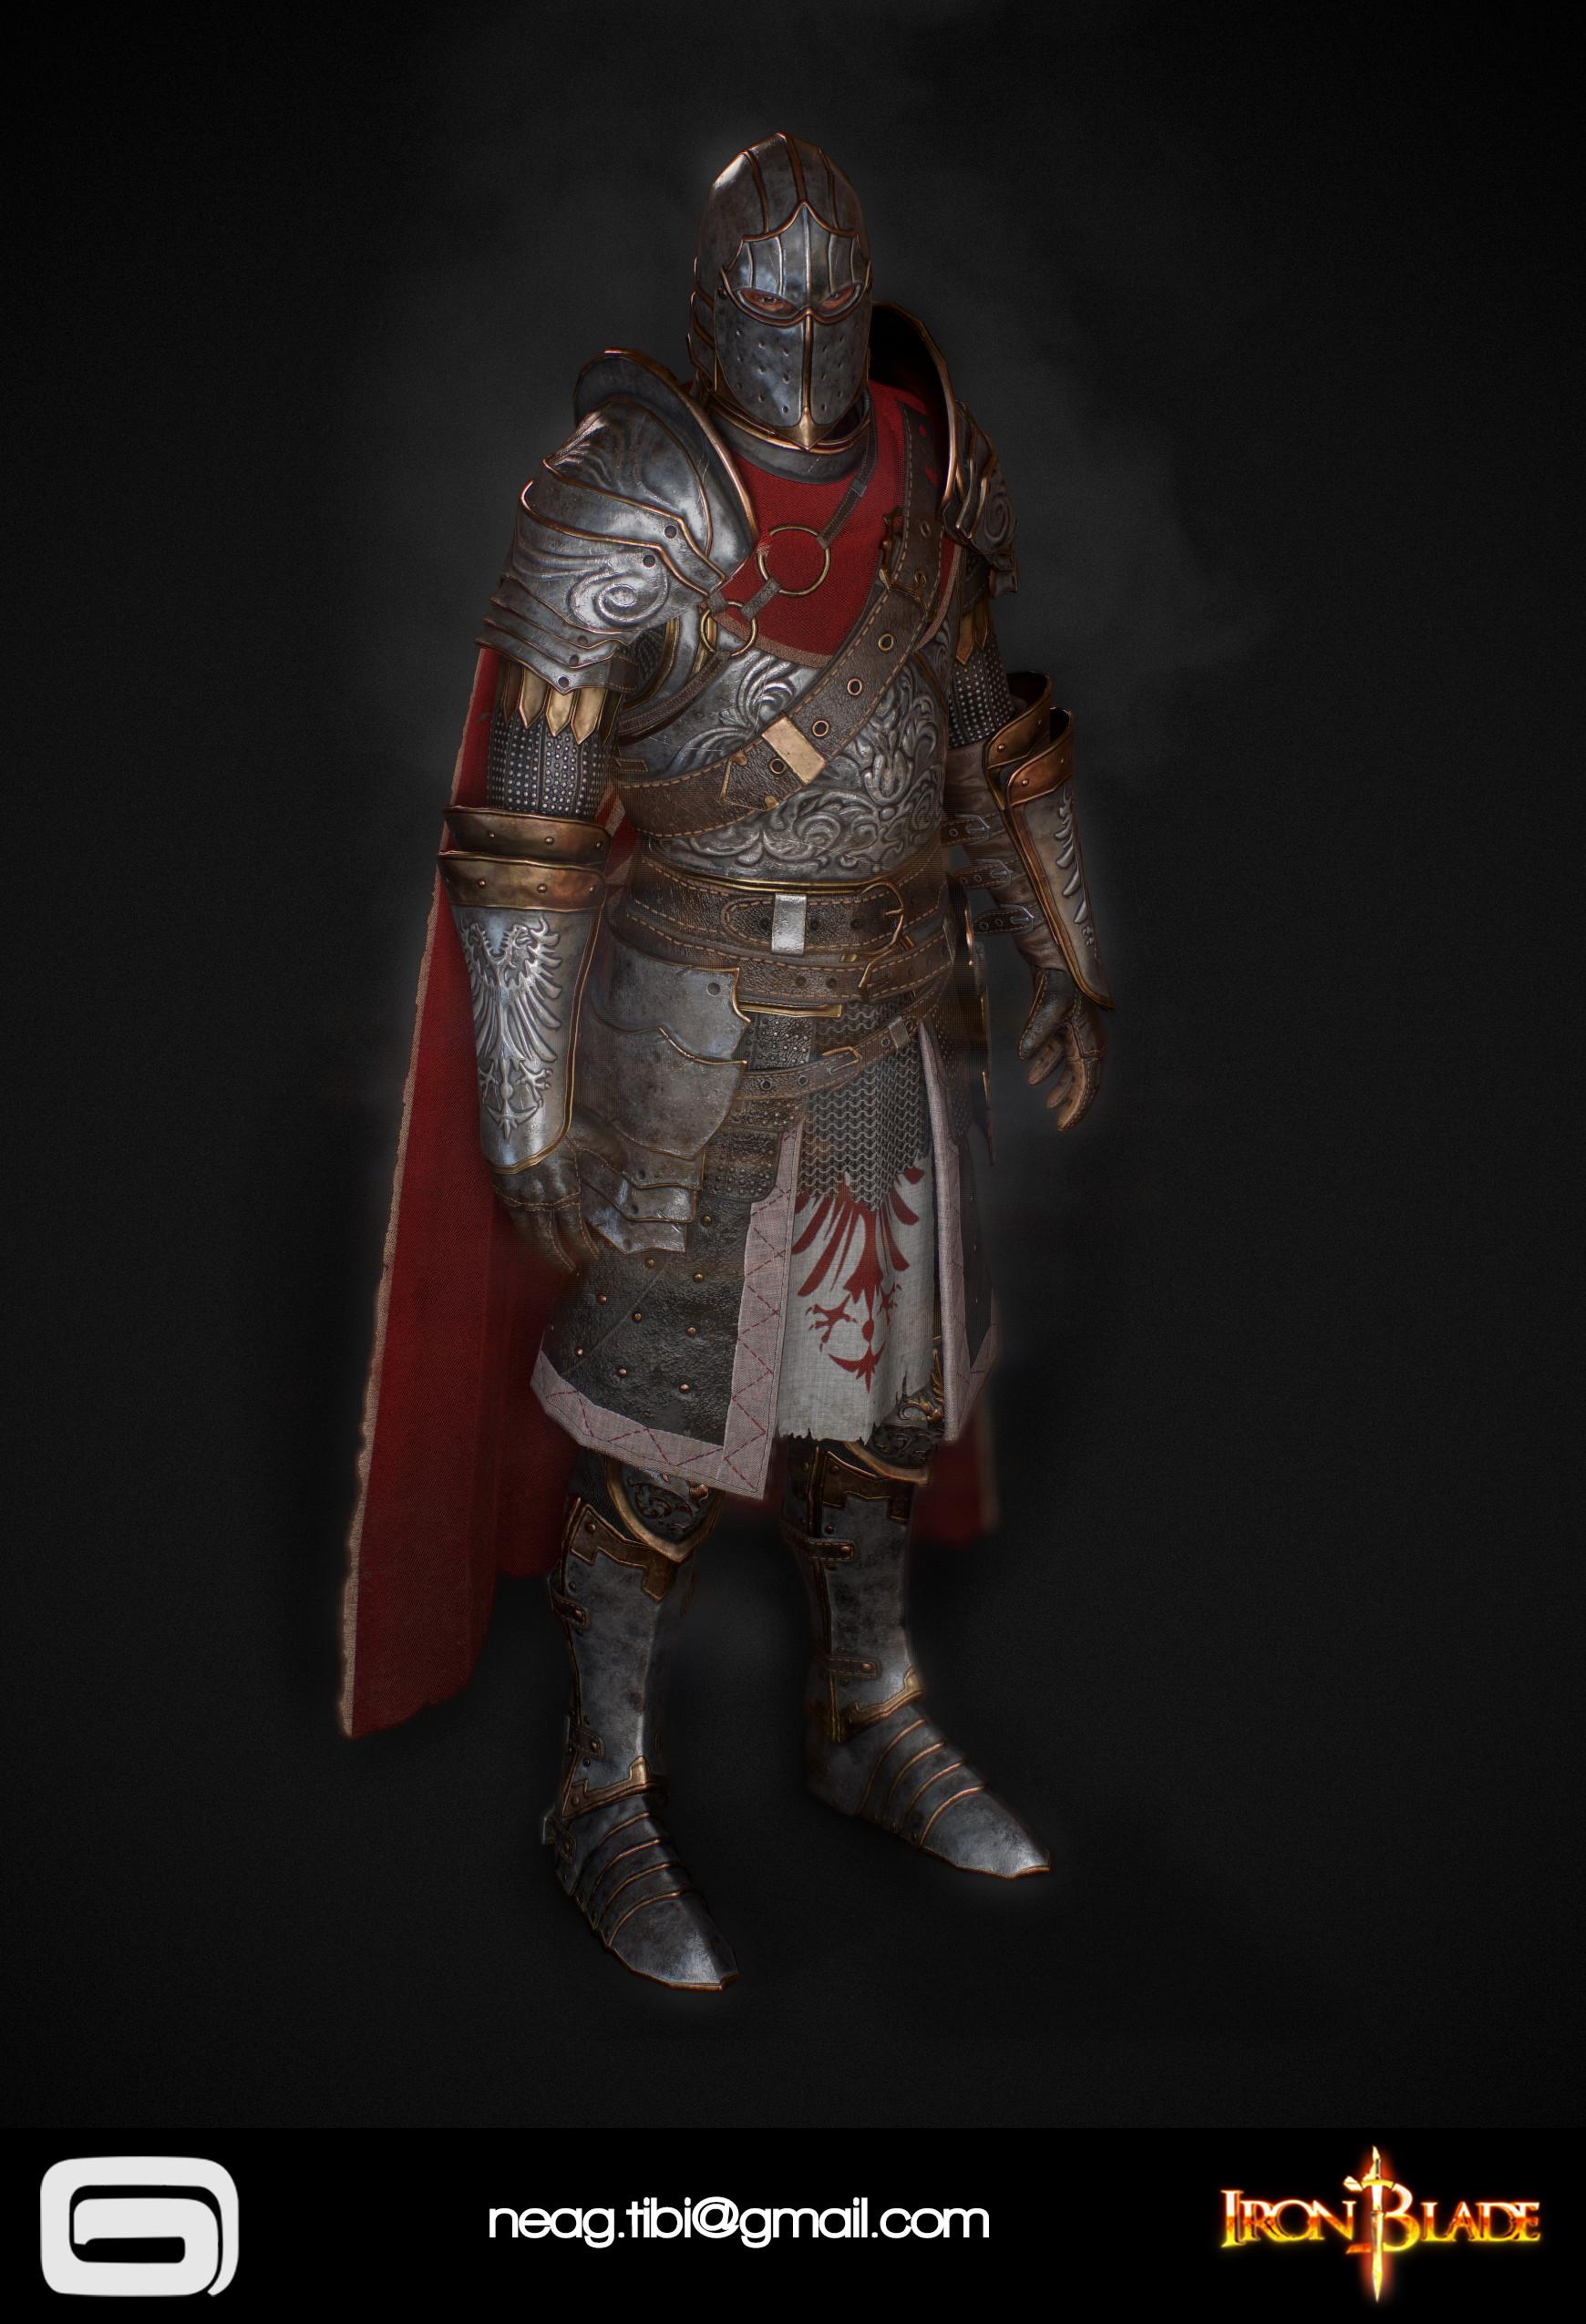 Tibi neag tibi neag iron blade mc armor 02c low poly 03